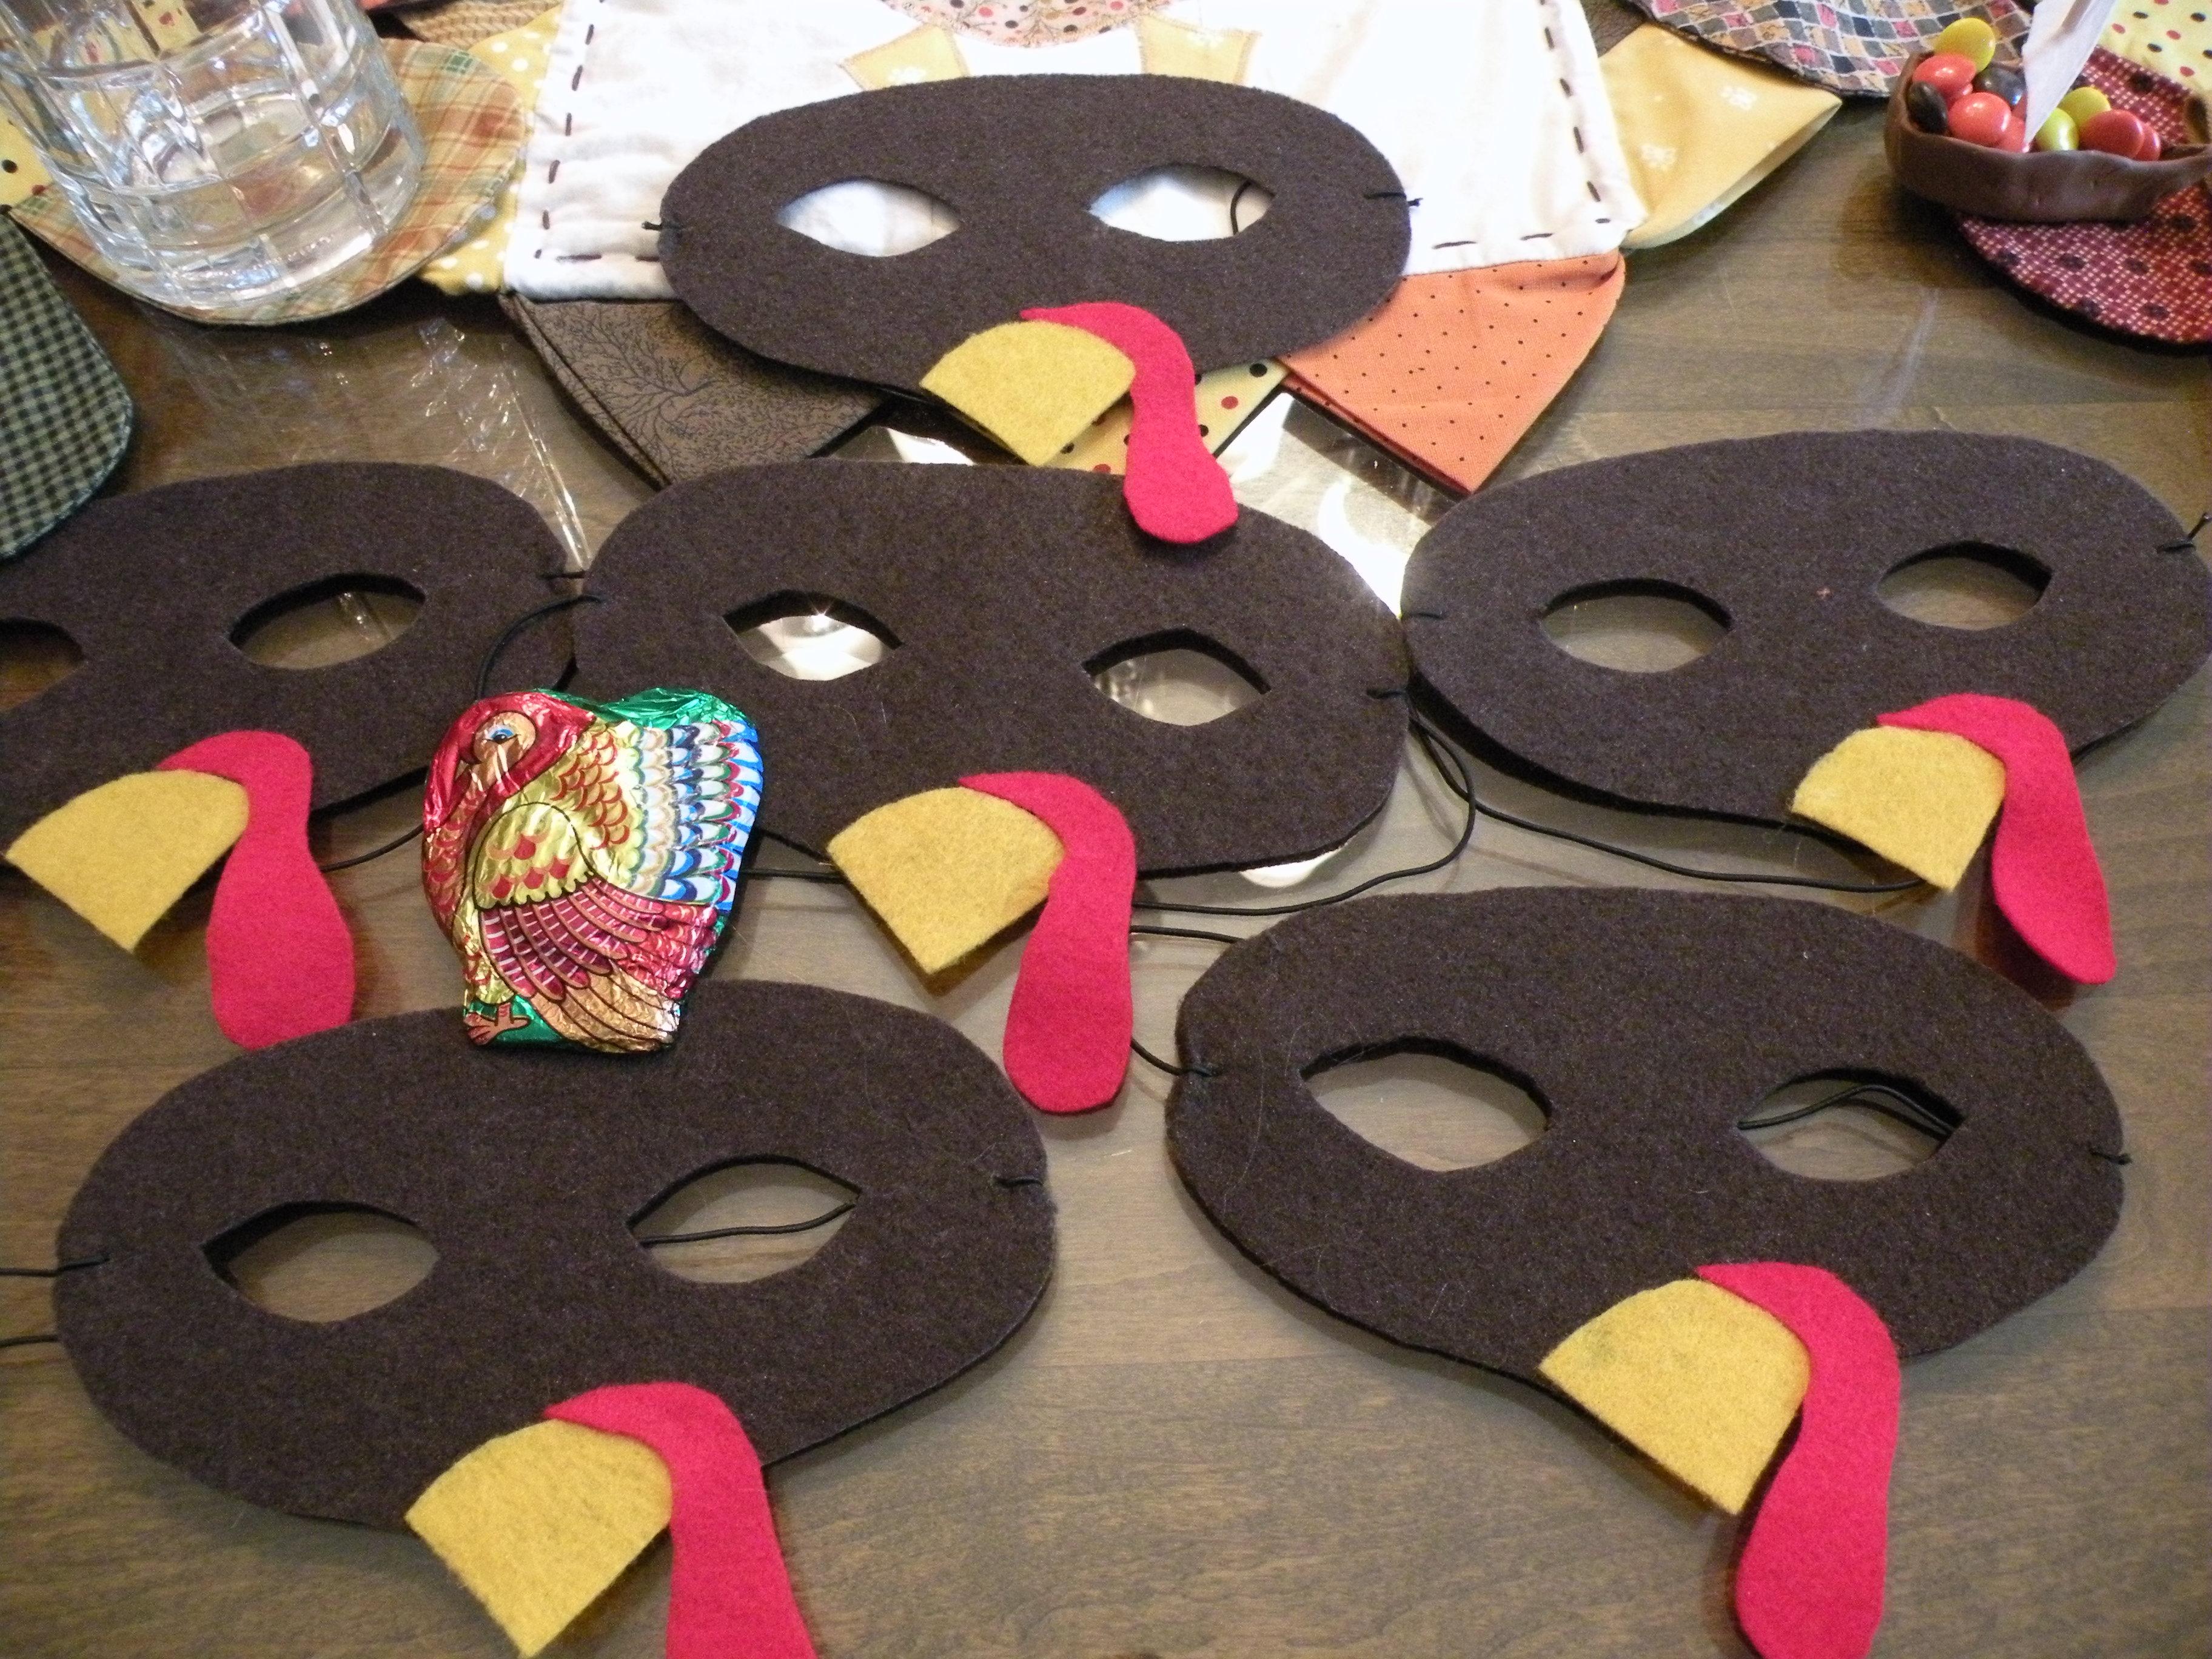 pots and pins creativity quilts diy projects grandbabies parties